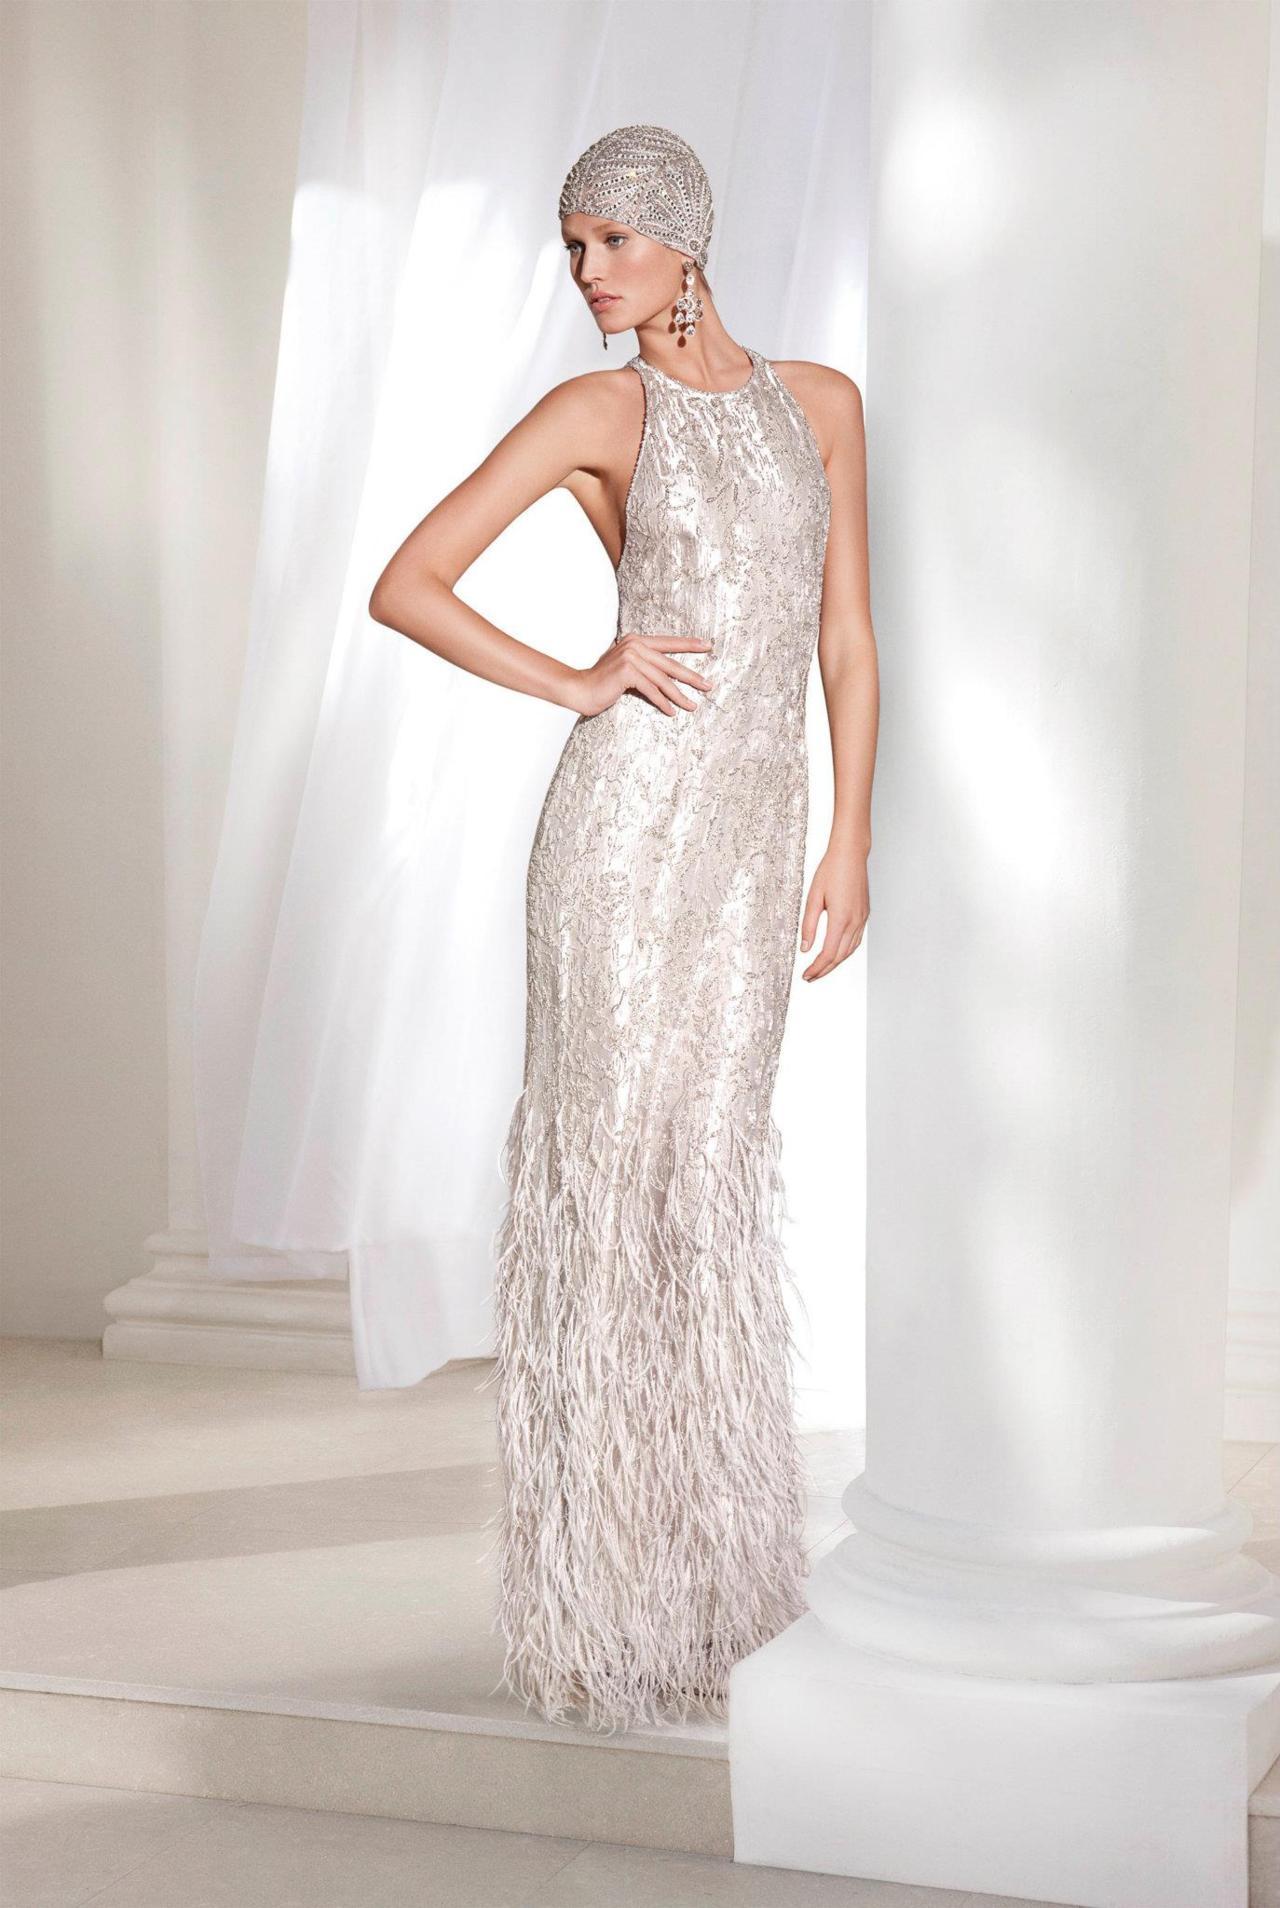 Glowing Dress